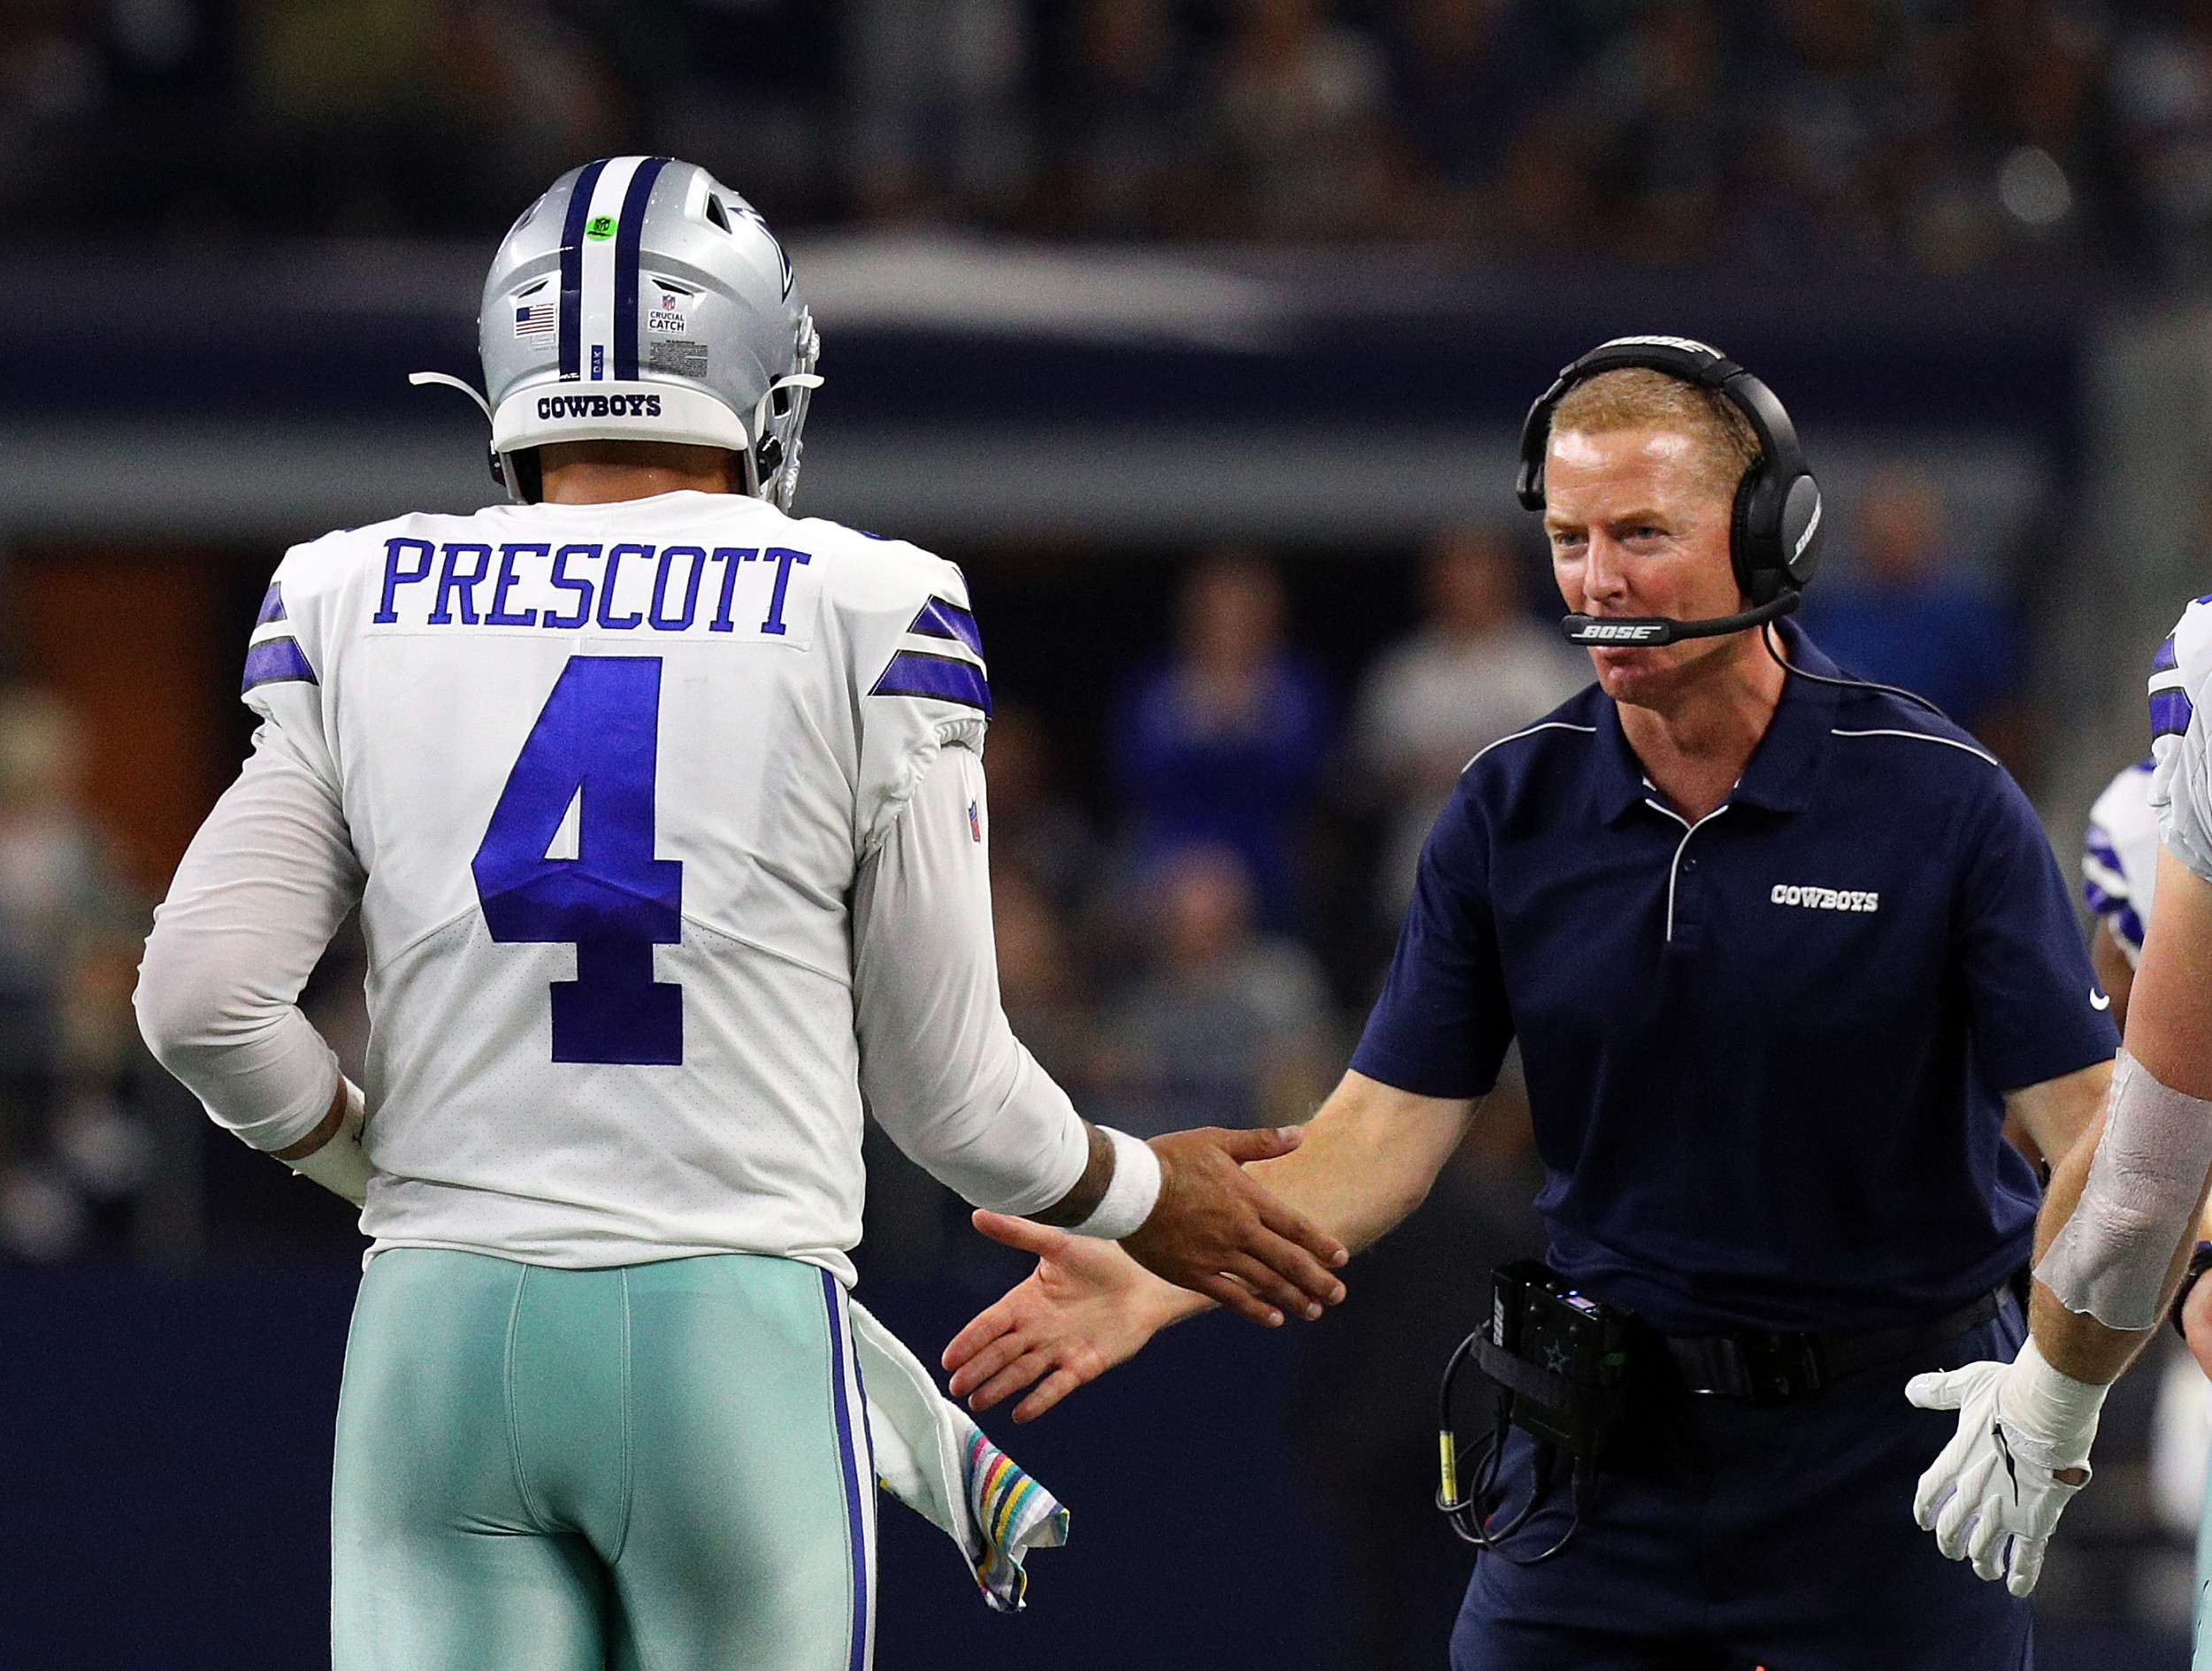 Monday Night Football 2019 Where To Watch Dallas Cowboys Vs